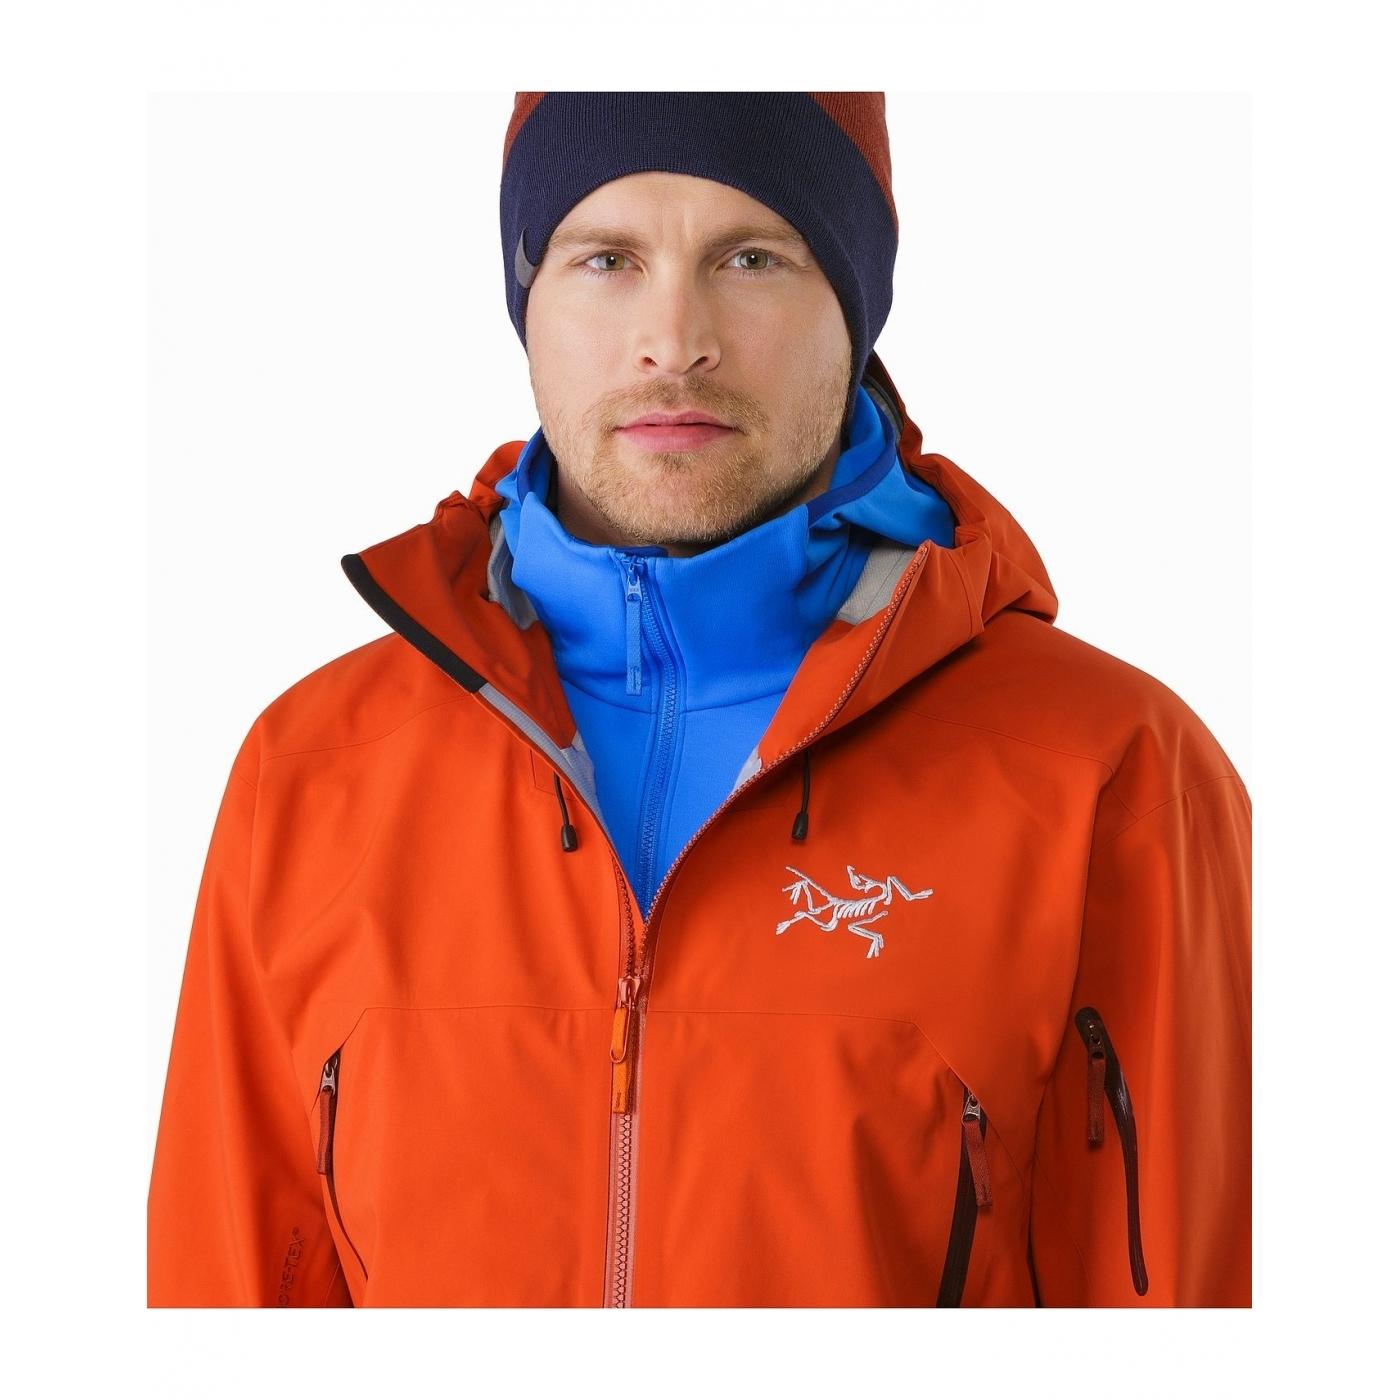 7871a0a261 Veste De Ski Arc'teryx Sabre Jacket Men's Stellar Gtx | Alltricks.com